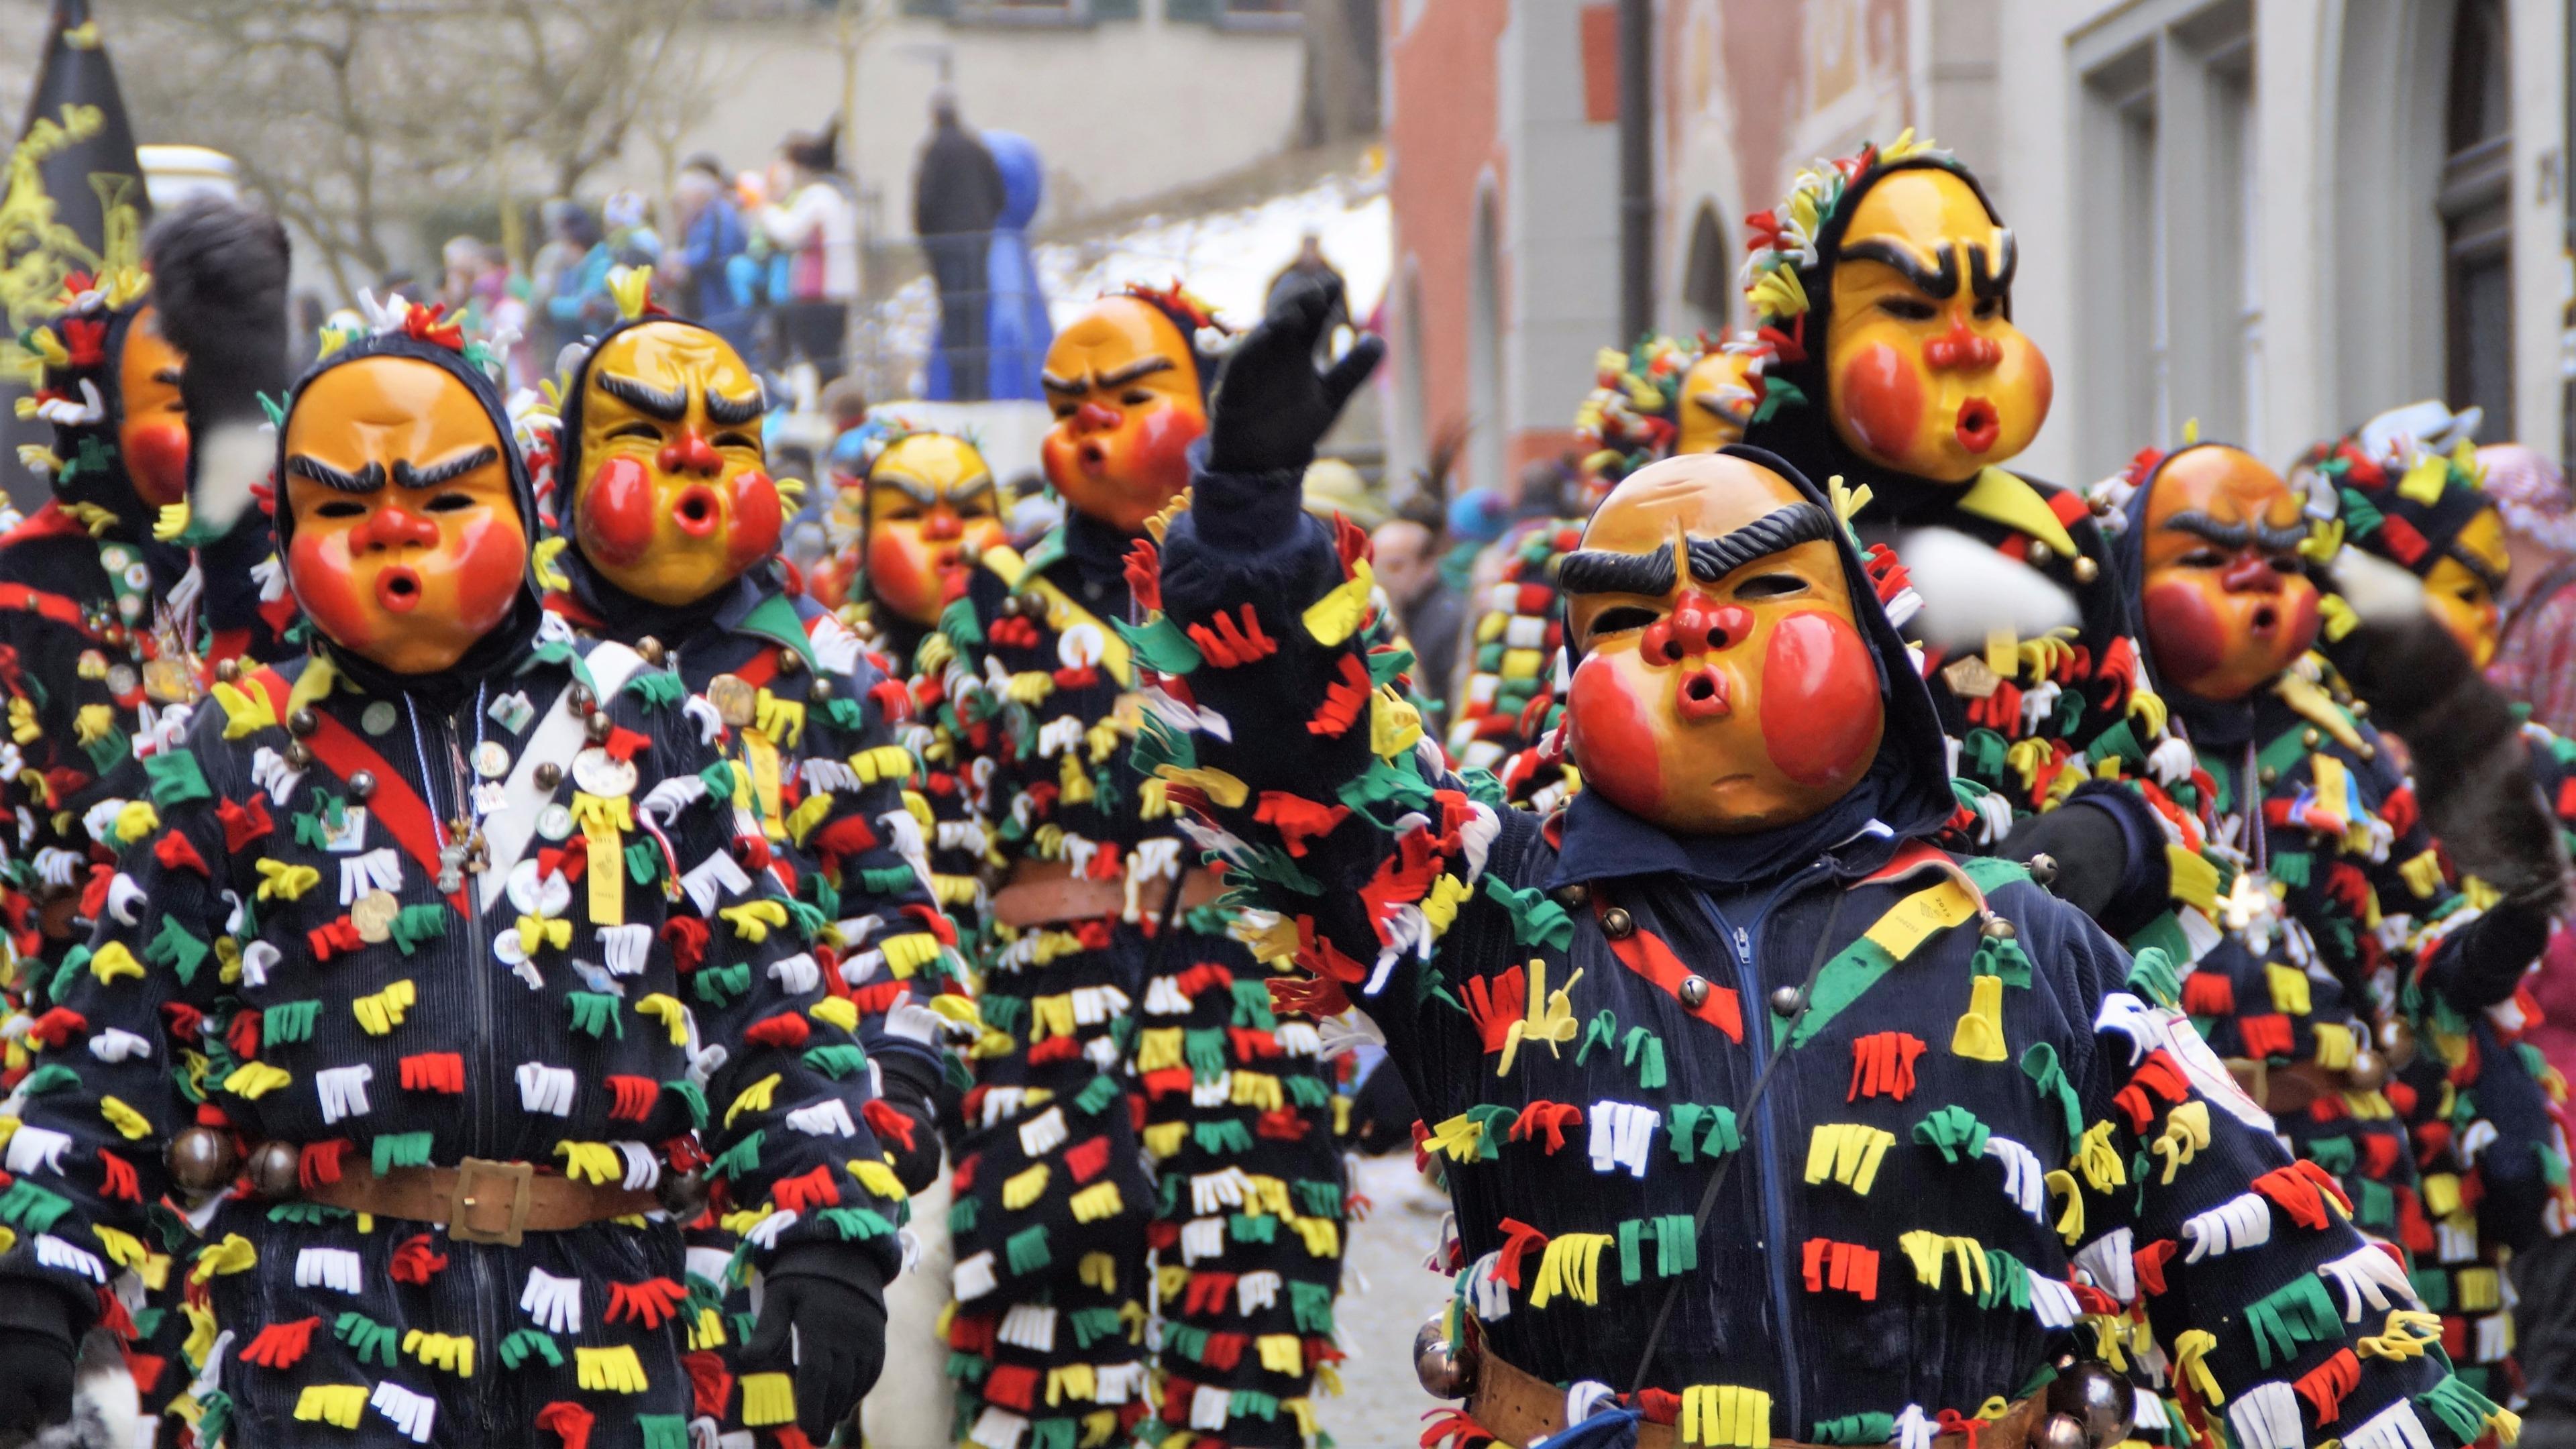 Carnival in Holland wallpaper